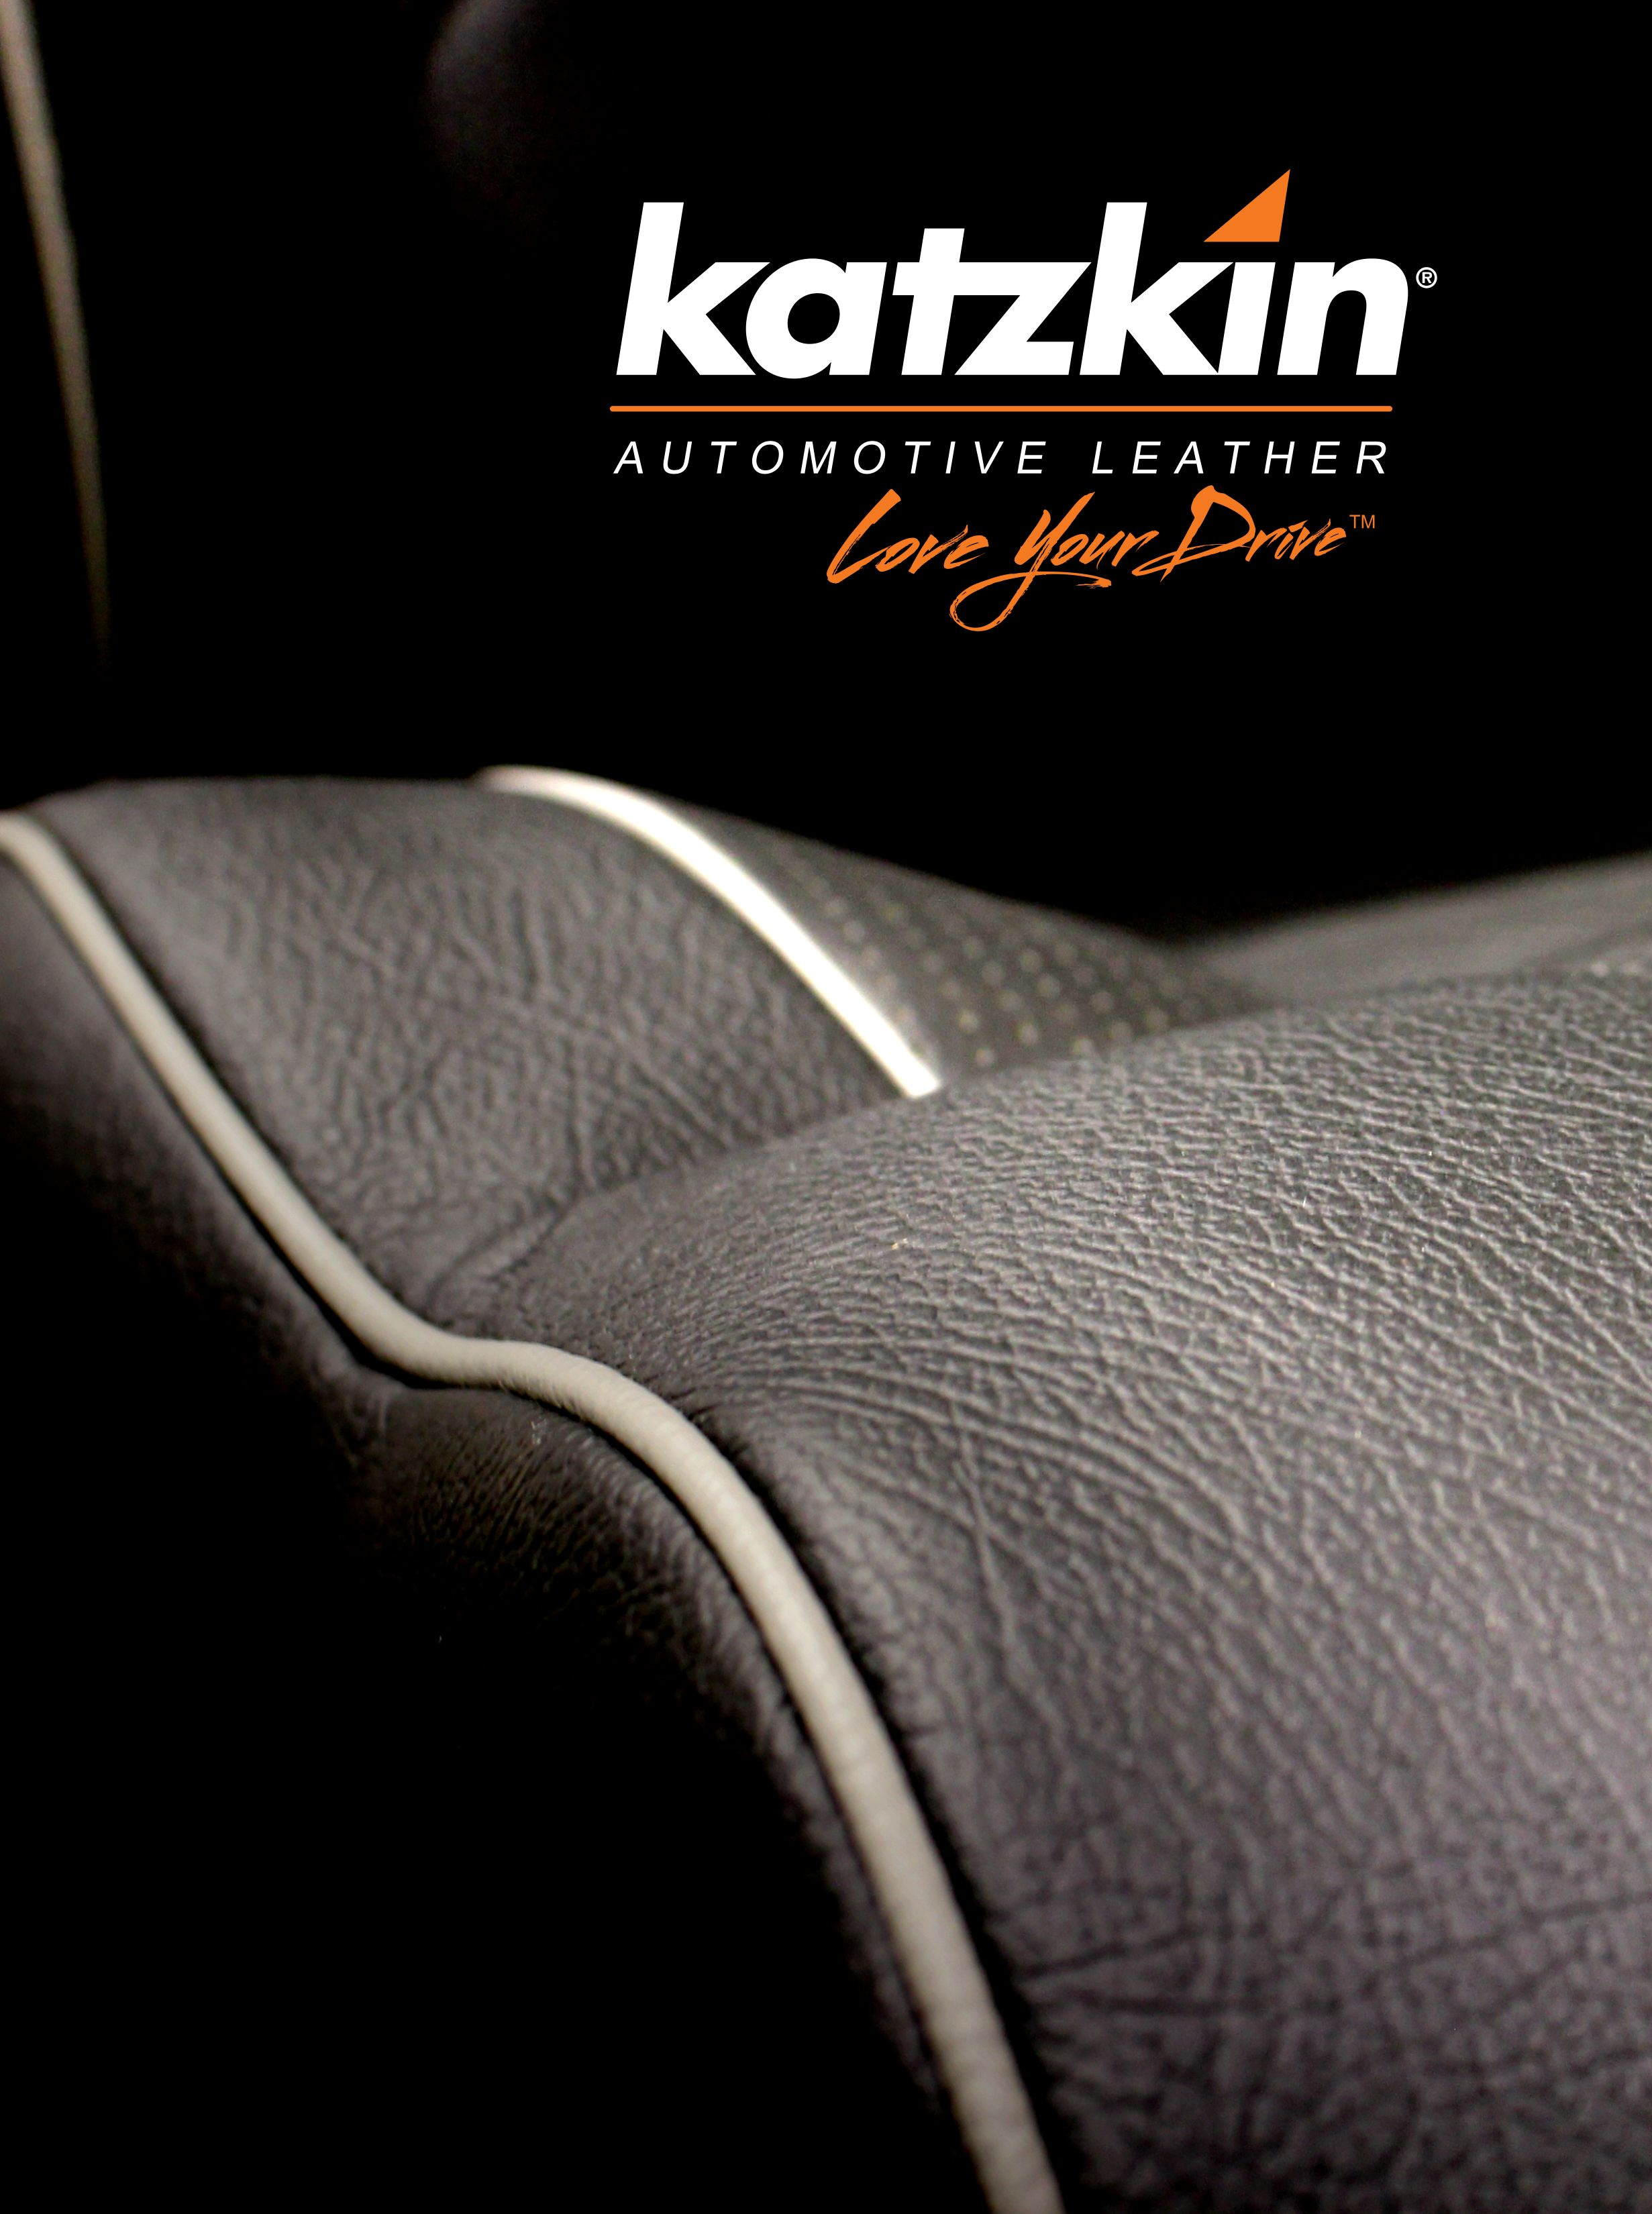 download 2017 Katzkin Swatch Card